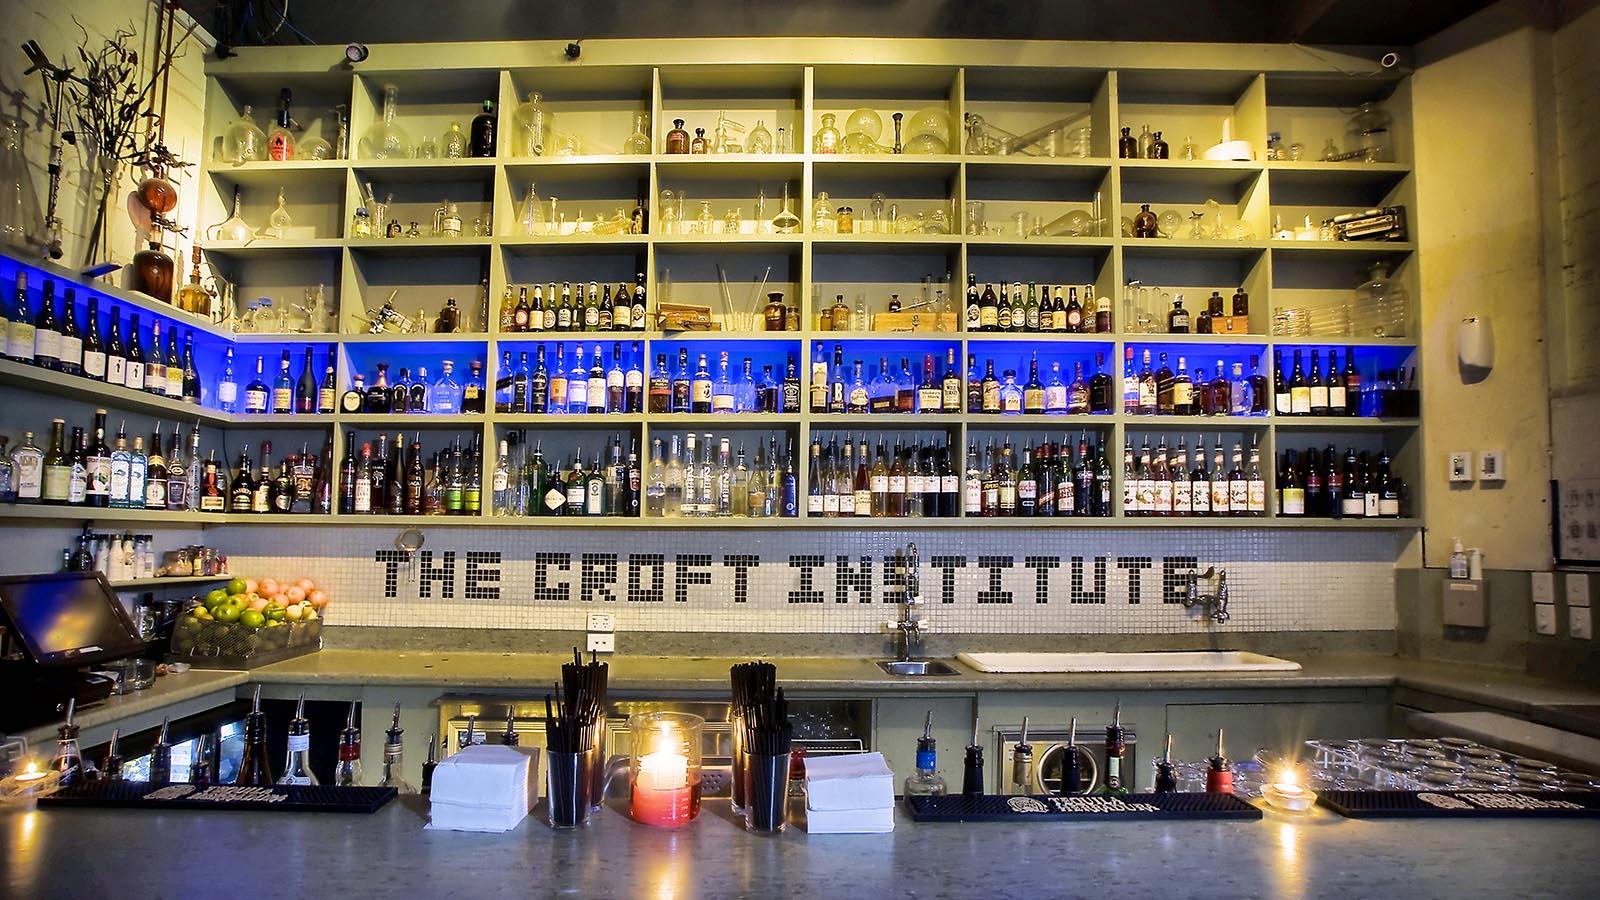 The Croft Institute, Melbourne, Victoria, Australia. Credit: Paul Louis Villiani